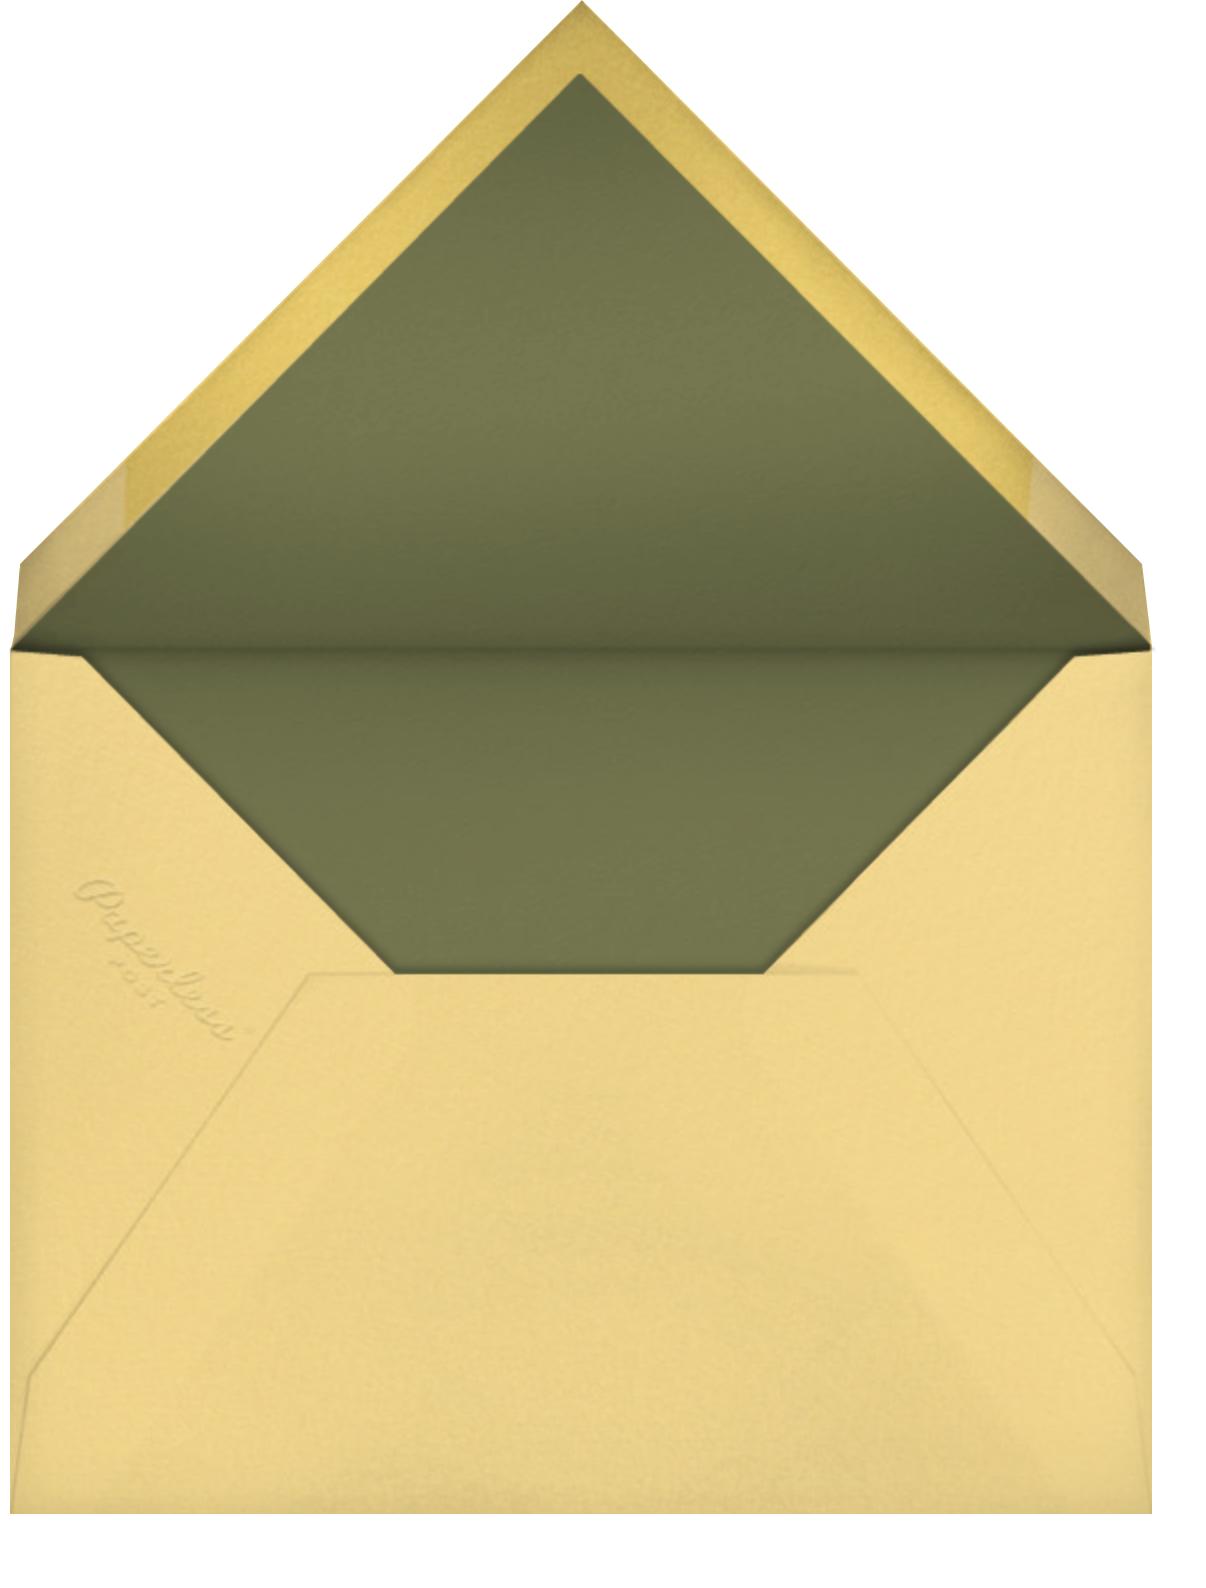 Handy Thank You (Barbara Dziadosz) - Red Cap Cards - Thank you - envelope back